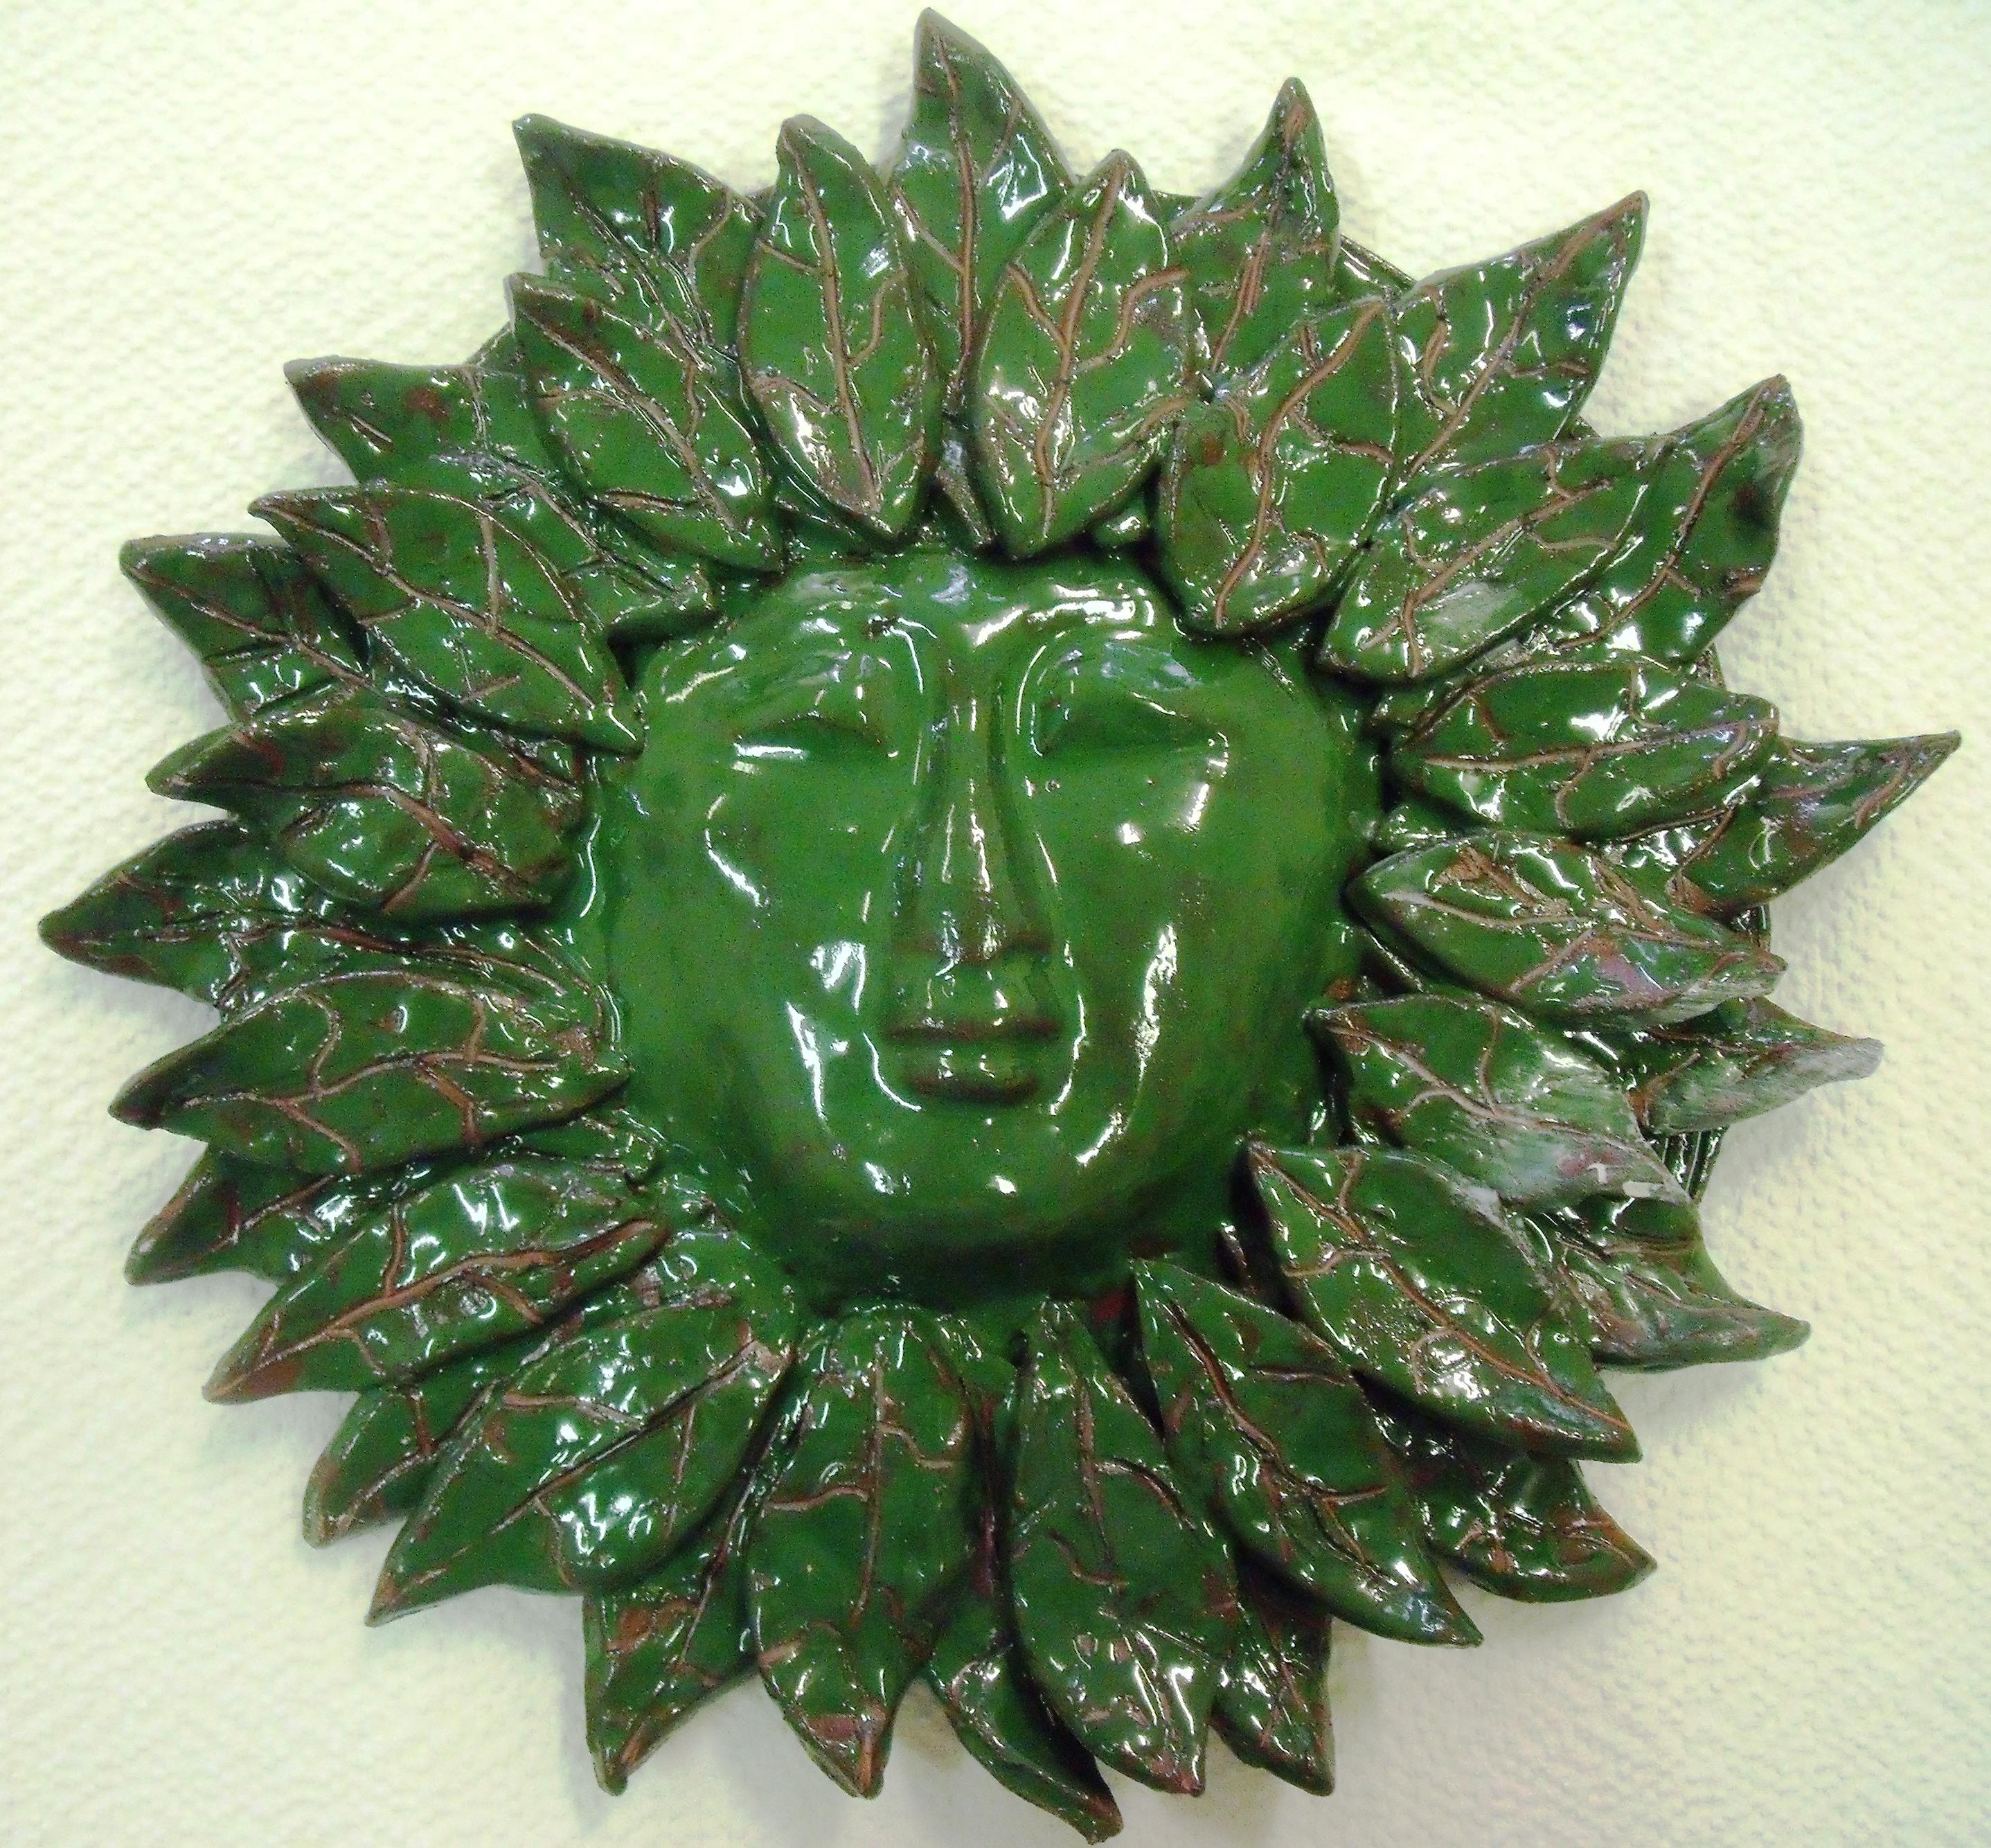 31911 || 5131 || The Green Man